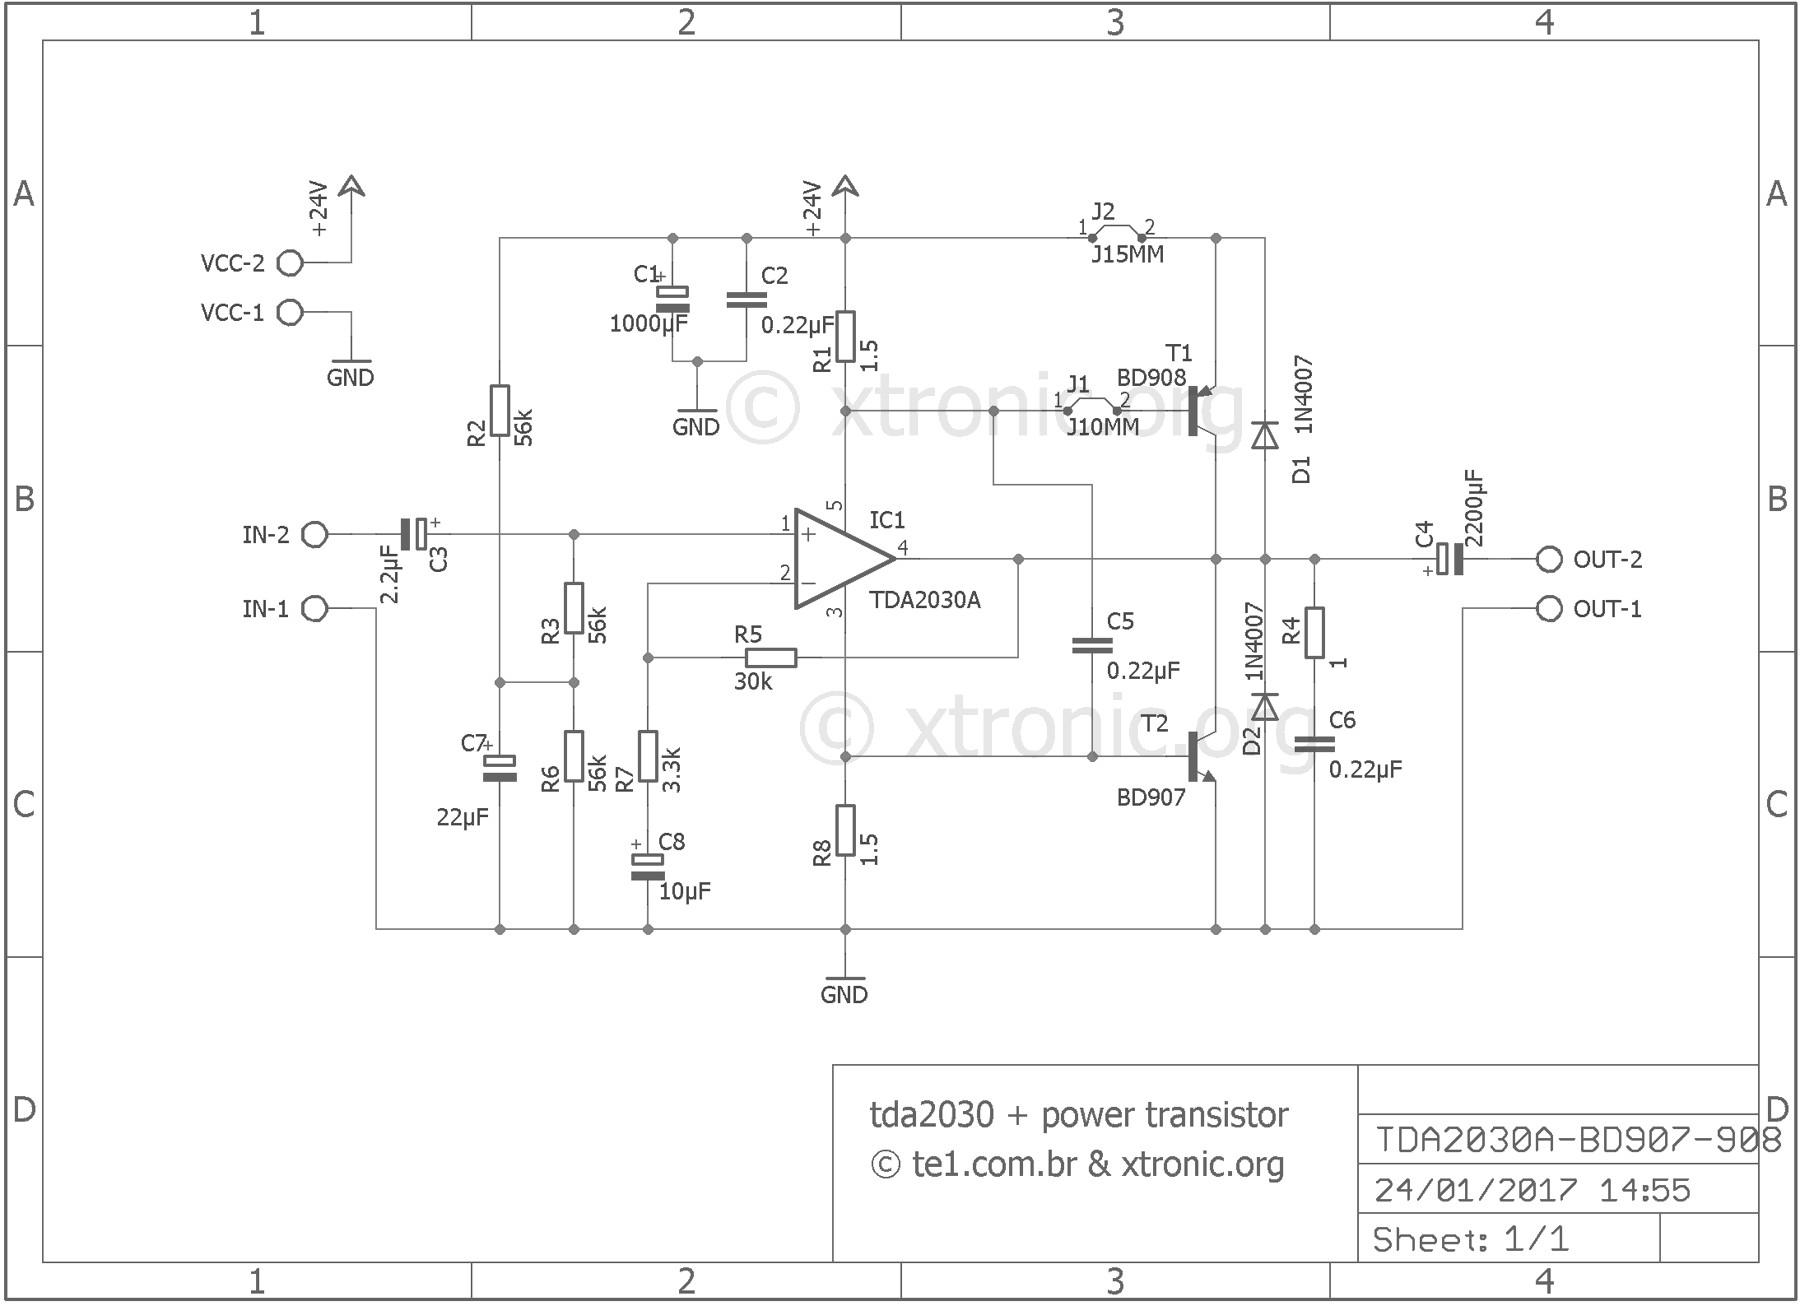 Tda 2040 Stereo Schematic Ev 7063] Hifi Audio Amplifier Circuit Based Tda2050 Audio Of Tda 2040 Stereo Schematic